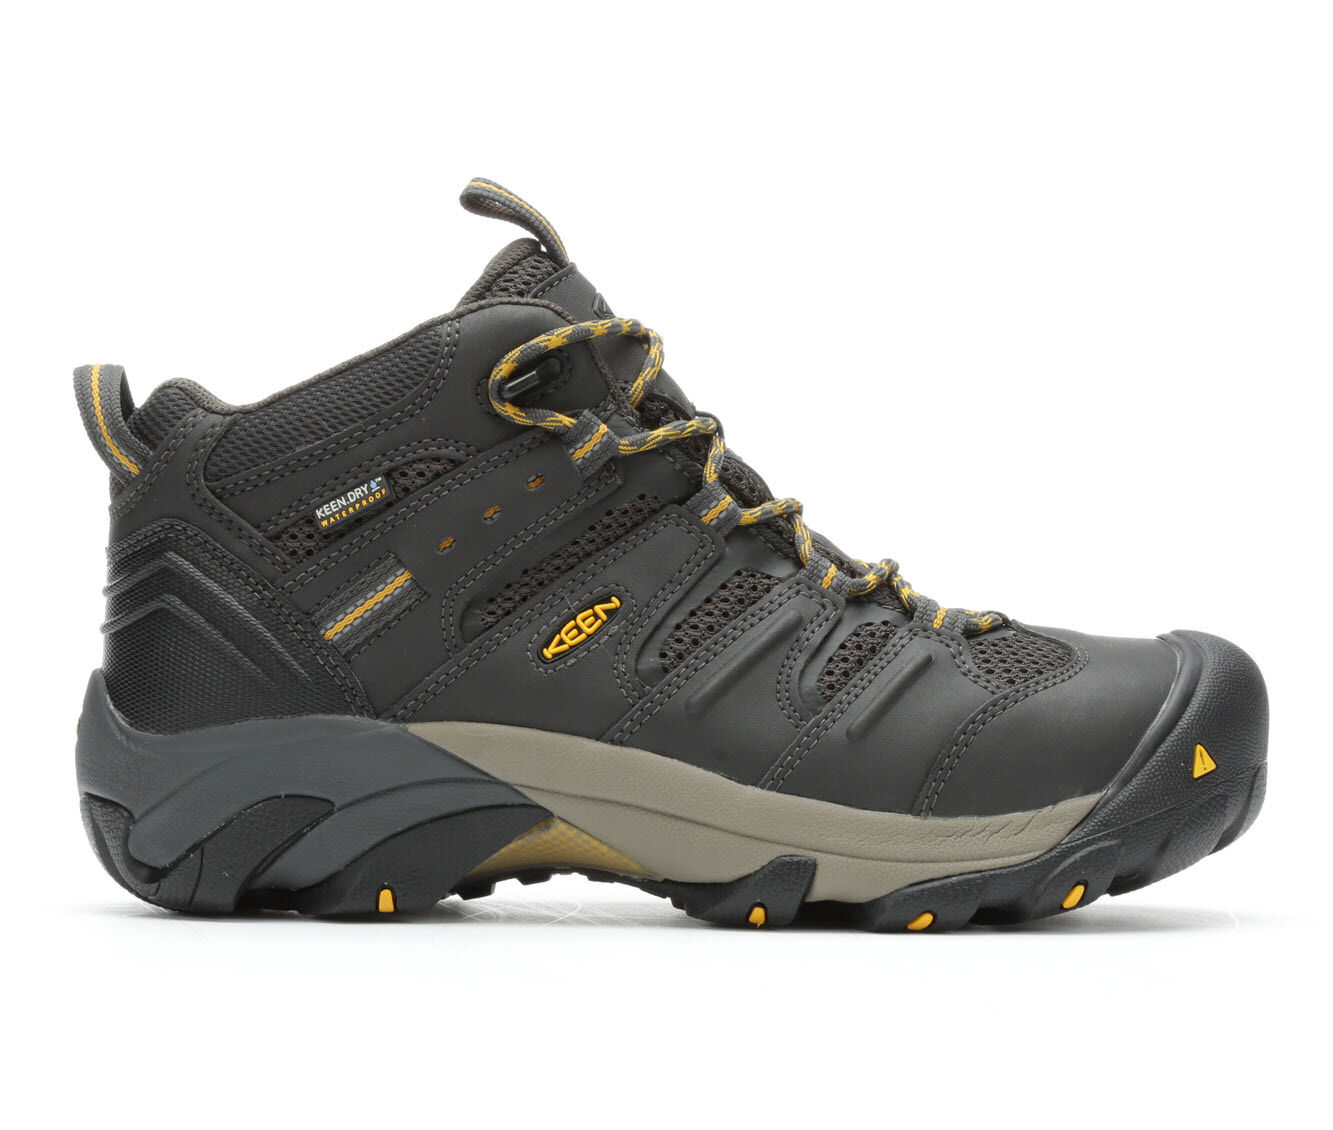 Men's KEEN Utility Lansing Mid Steel Toe Waterproof Work Boots Raven/Olive